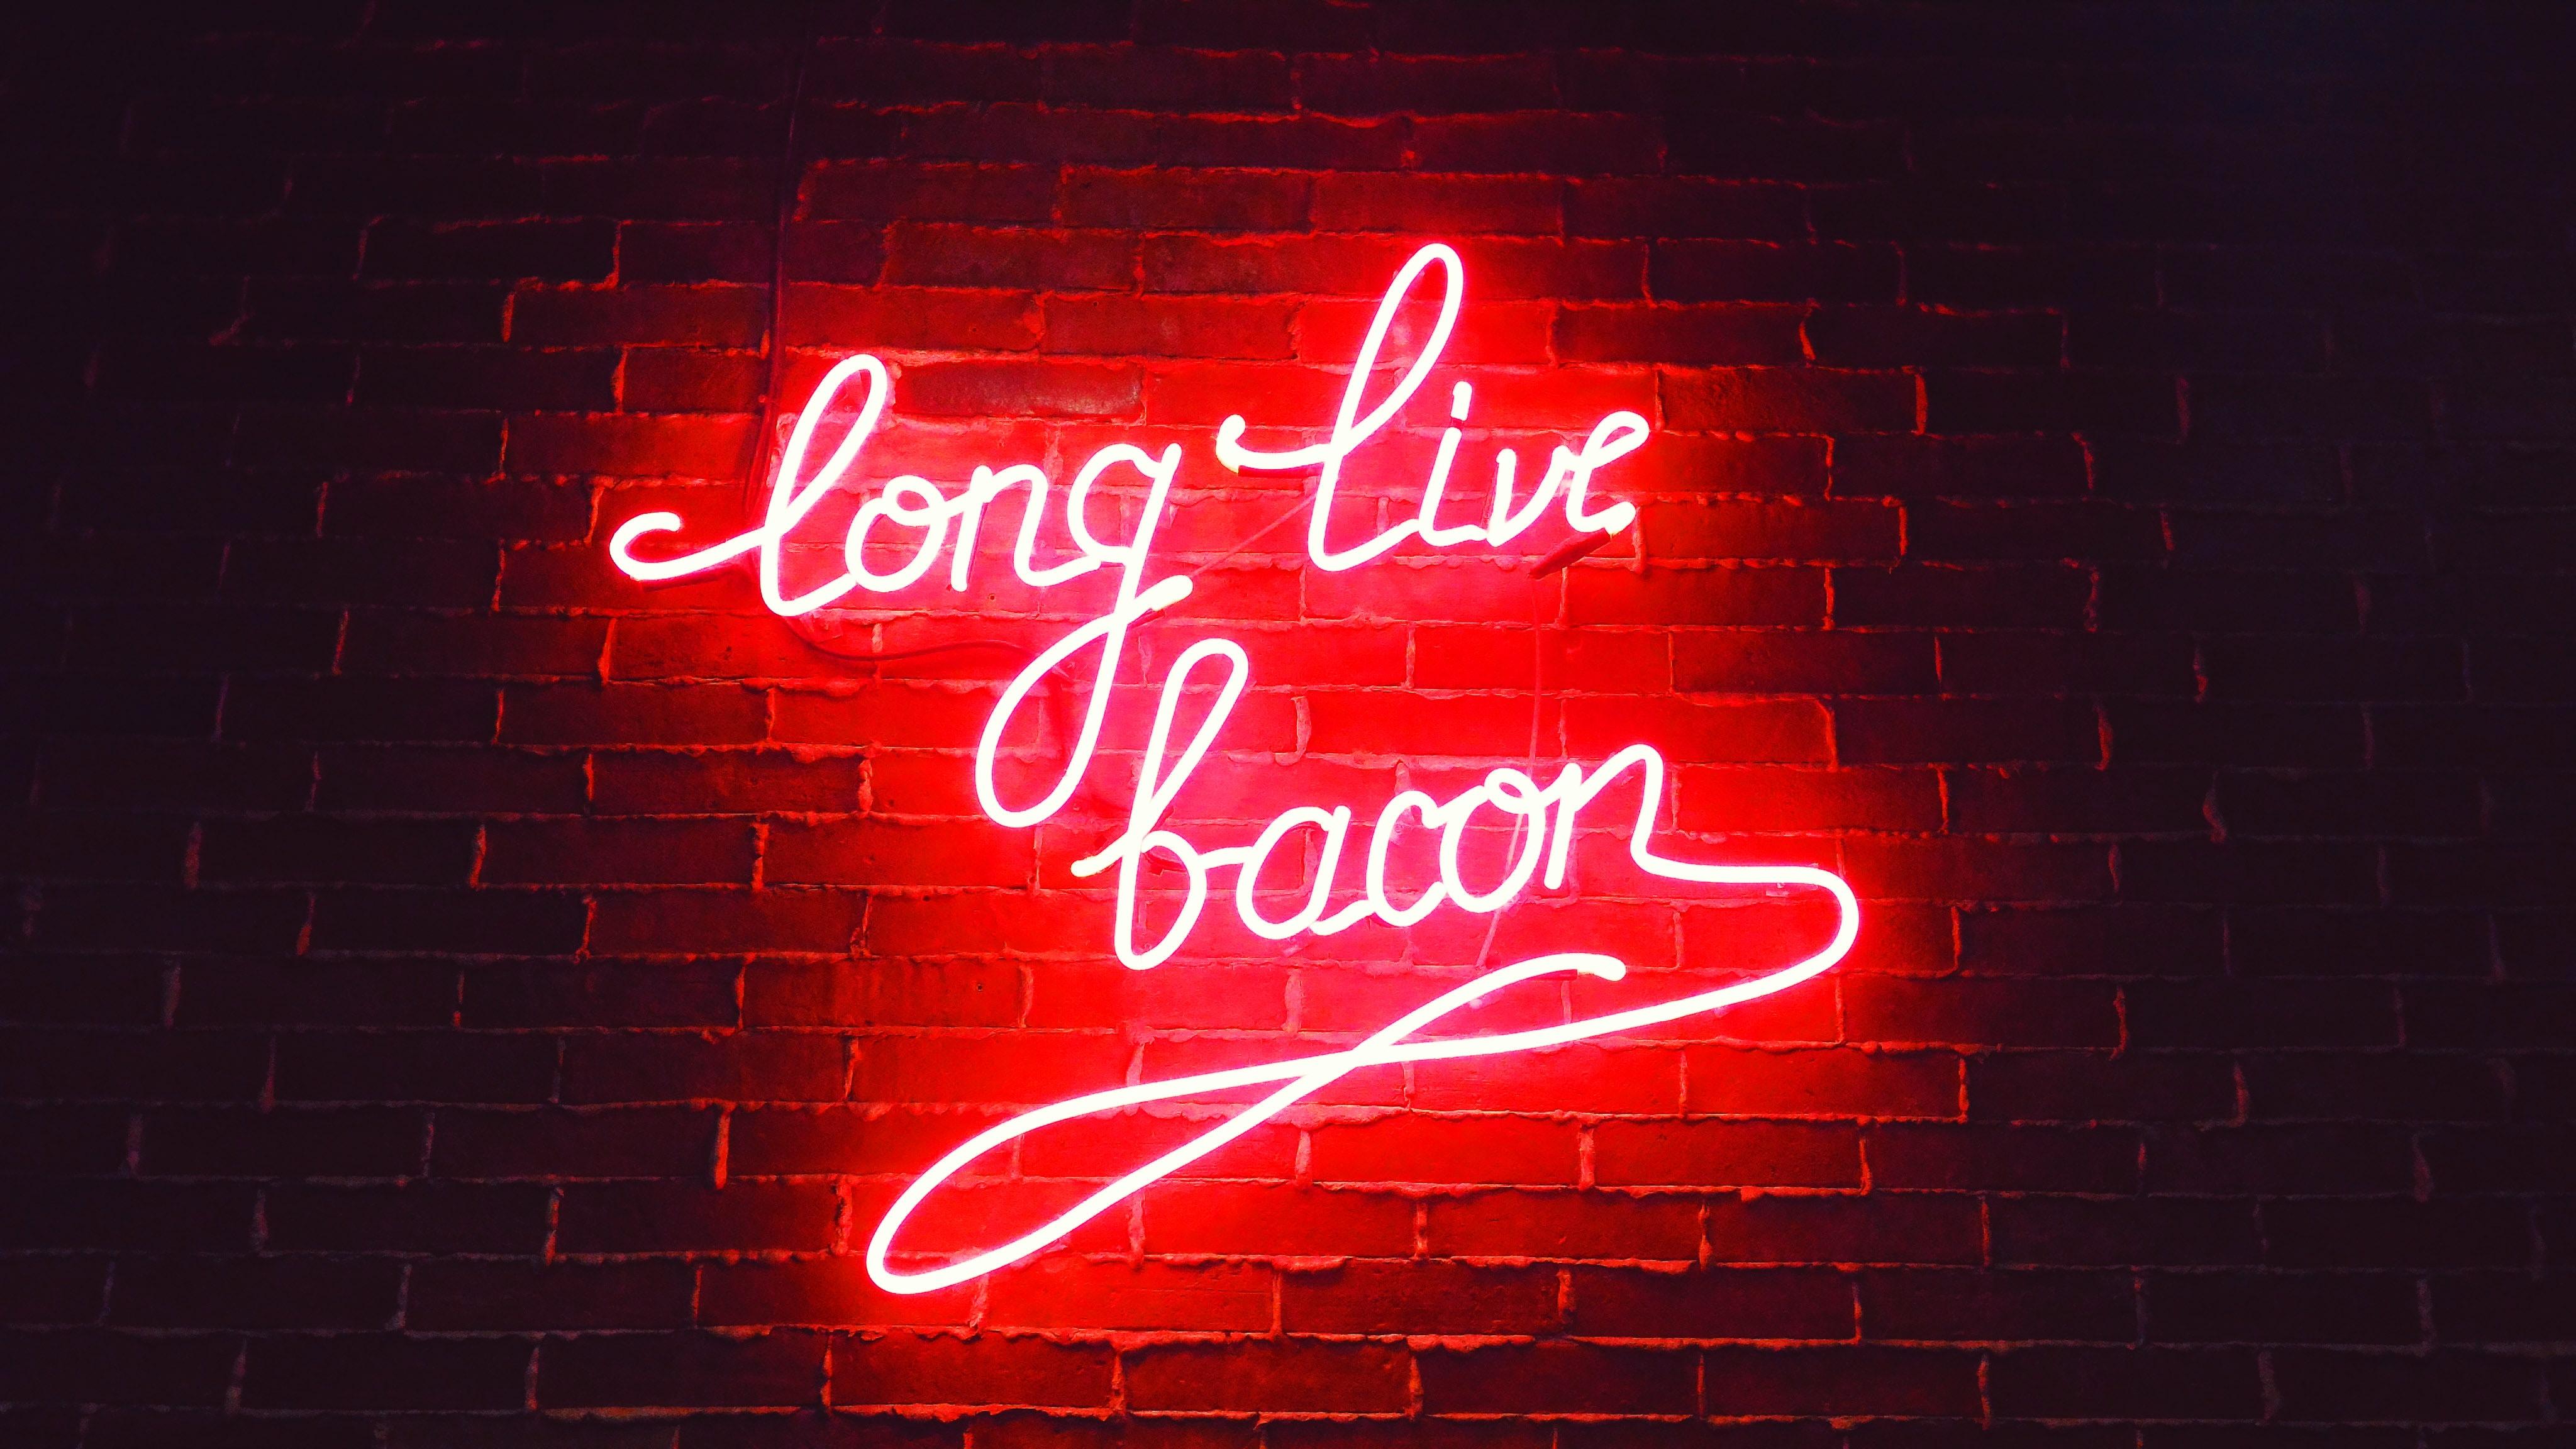 1280x2120 Long Live Bacon Neon Lights Iphone 6 Hd 4k